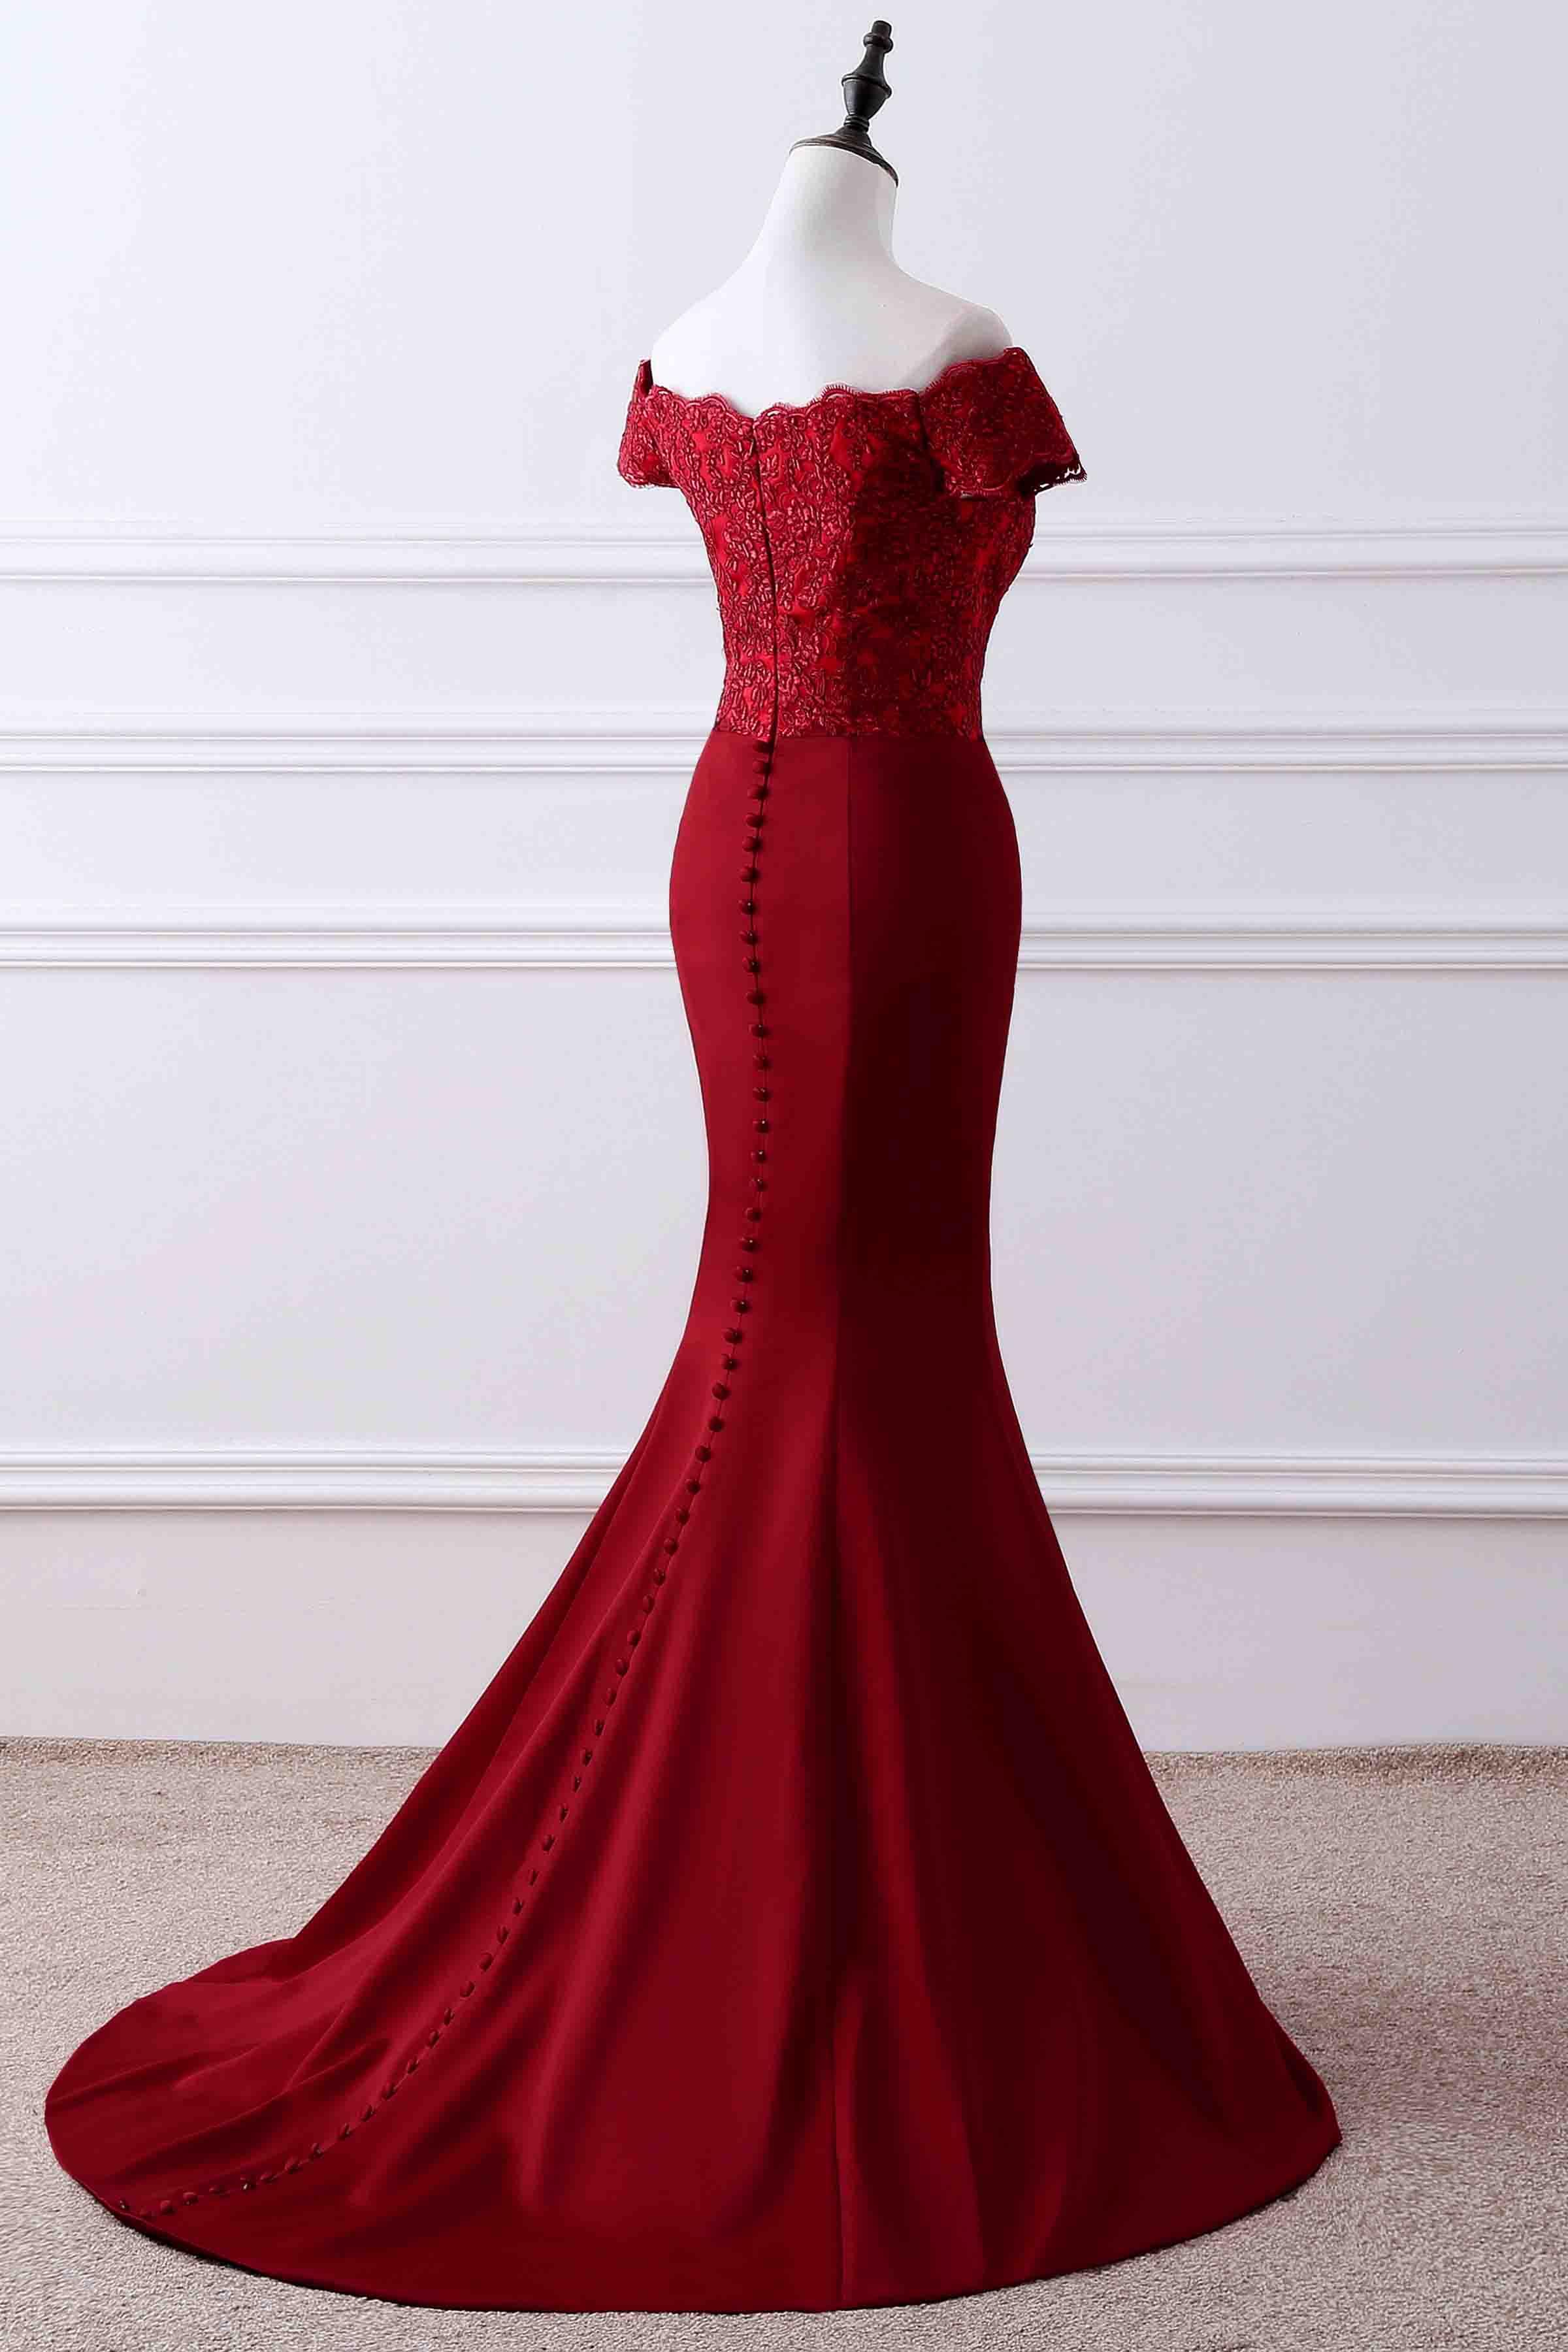 Red Satins Lace Off Shoulder Mermaid Long Prom Dressformal Dresses